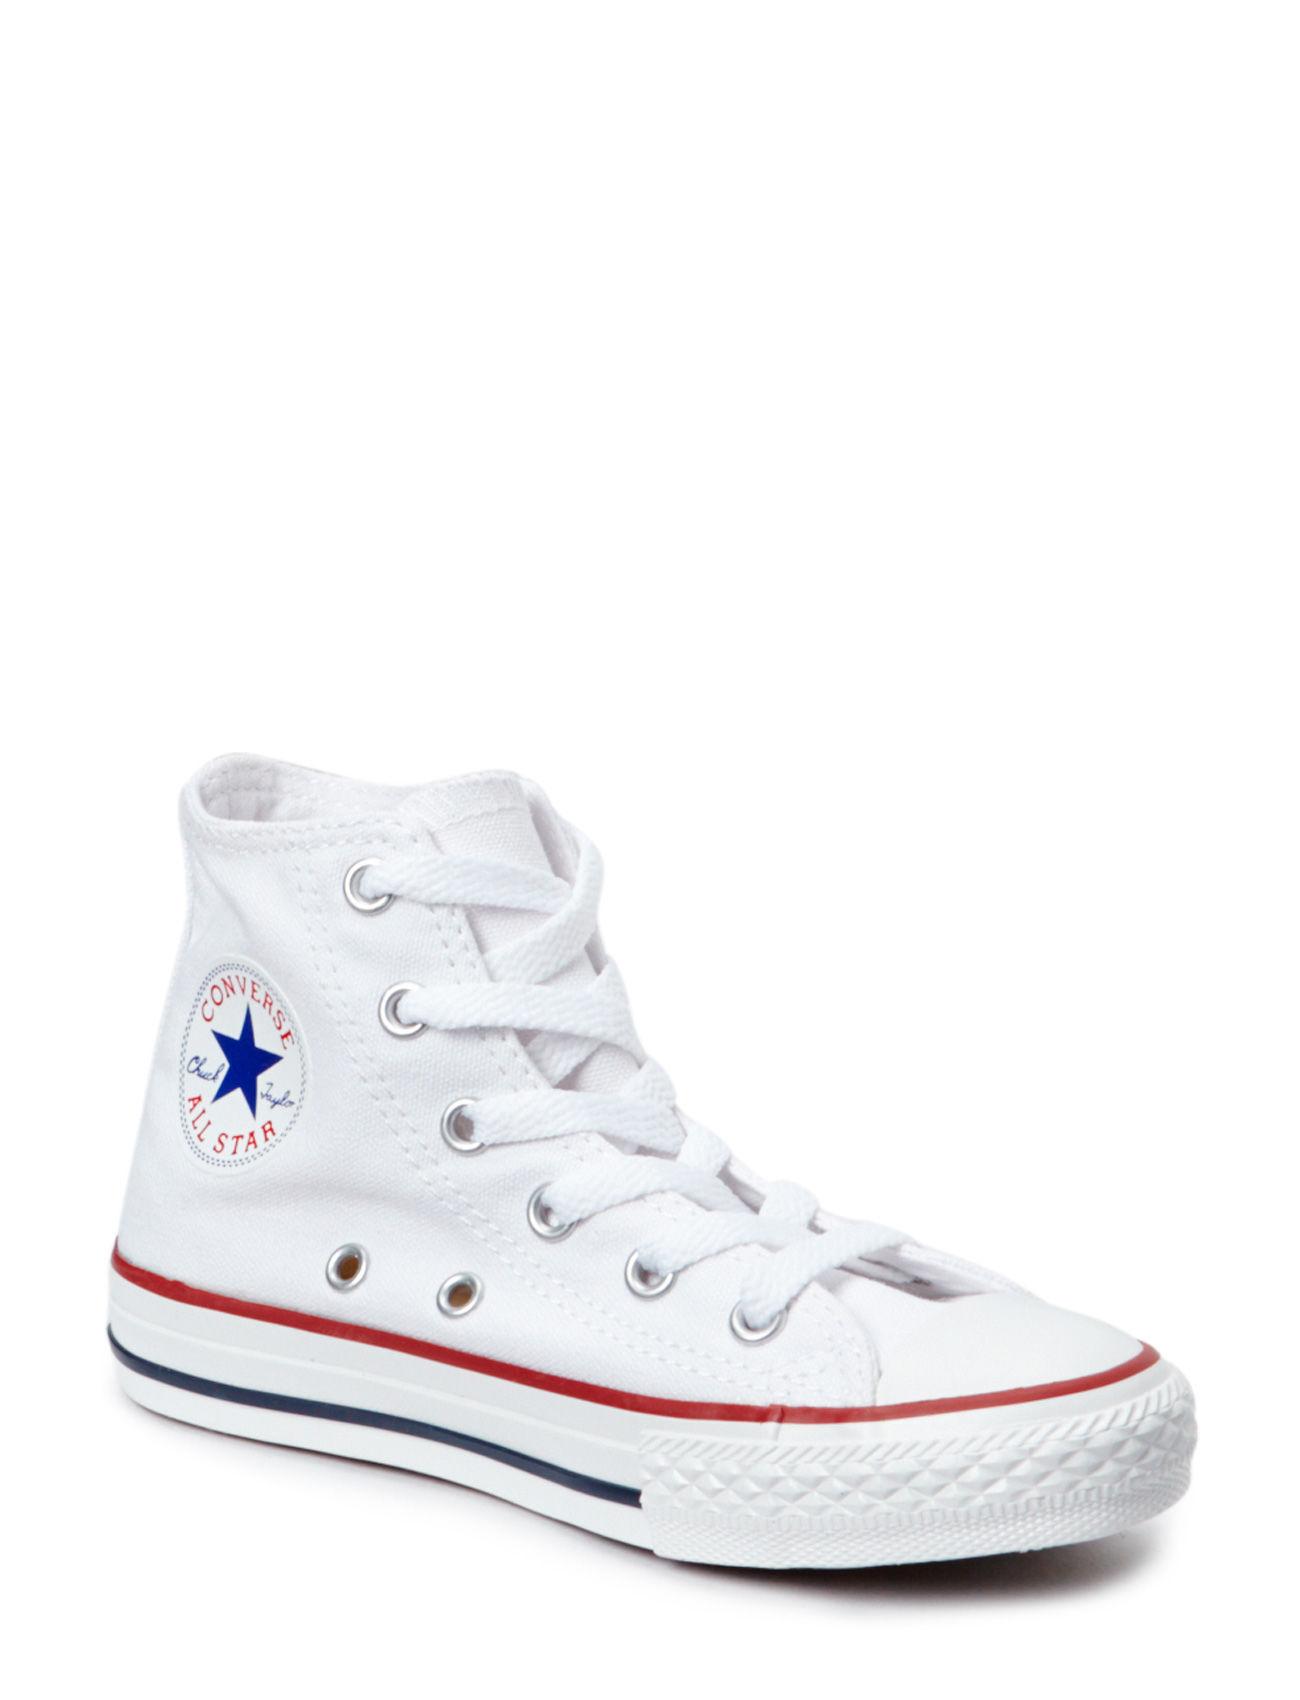 As Canvas Converse Sko & Sneakers til Børn i Sort